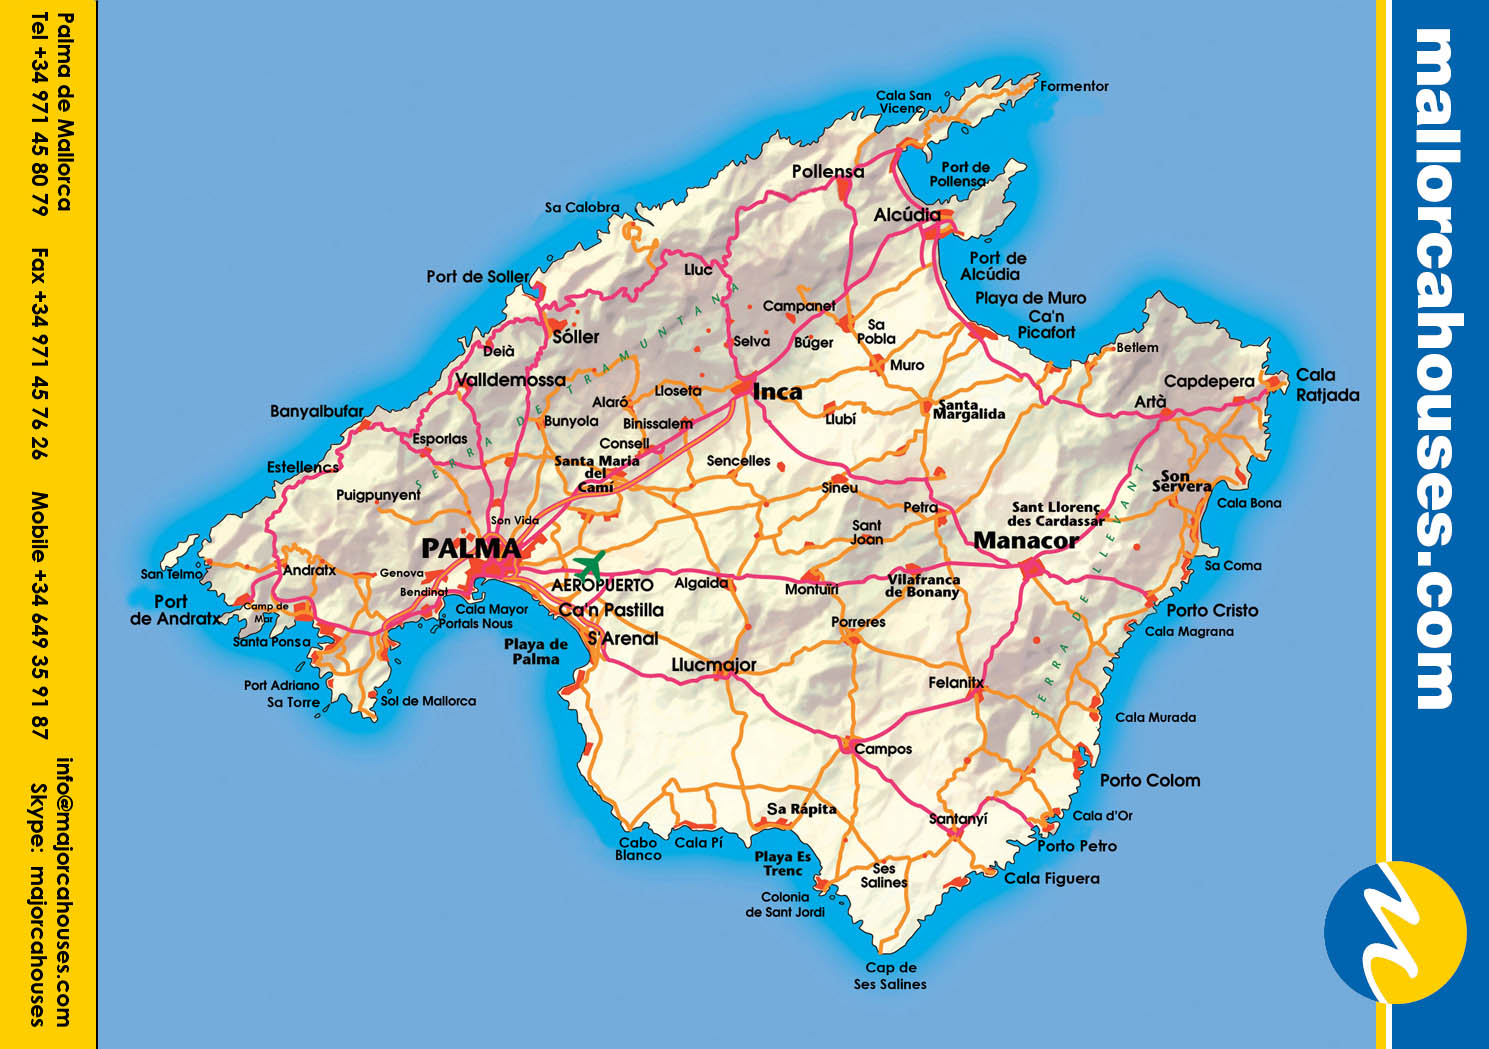 mapa de palma de maiorca Mapas de Palma   Espanha | MapasBlog mapa de palma de maiorca